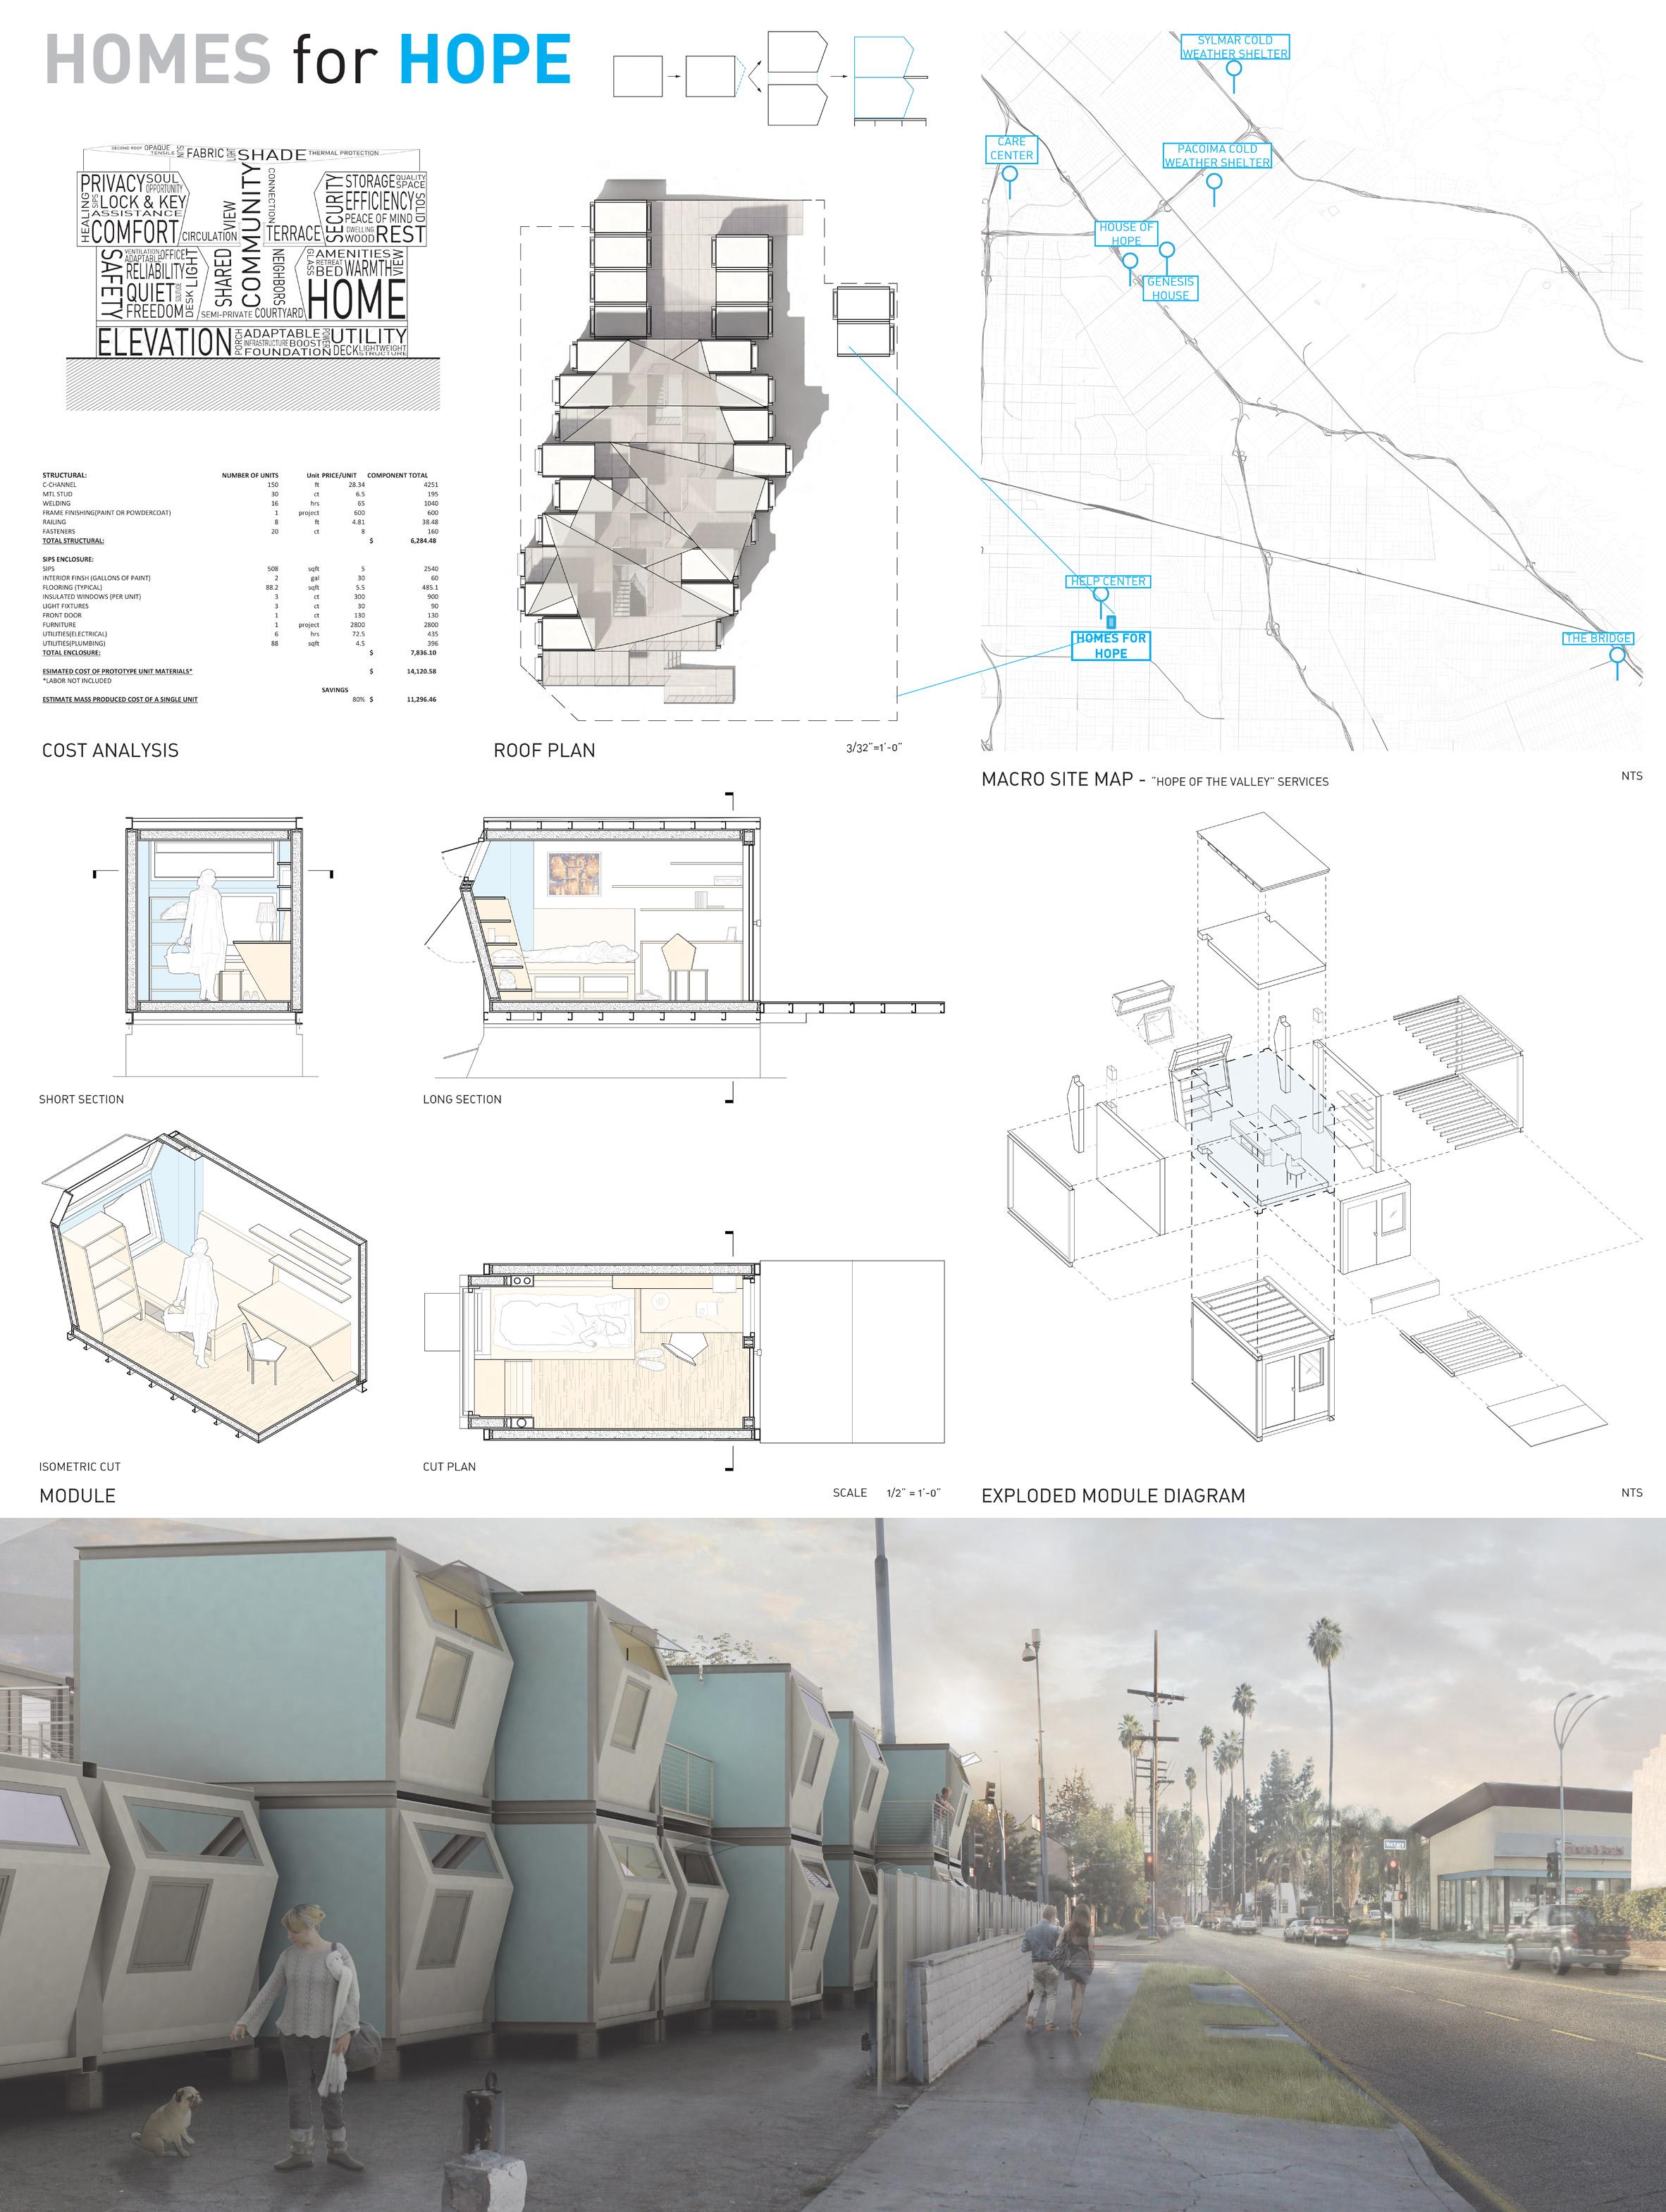 rendering-homes-for-hope-homeless-studio-project-madworkshop-_dezeen_2364_col_0.jpg